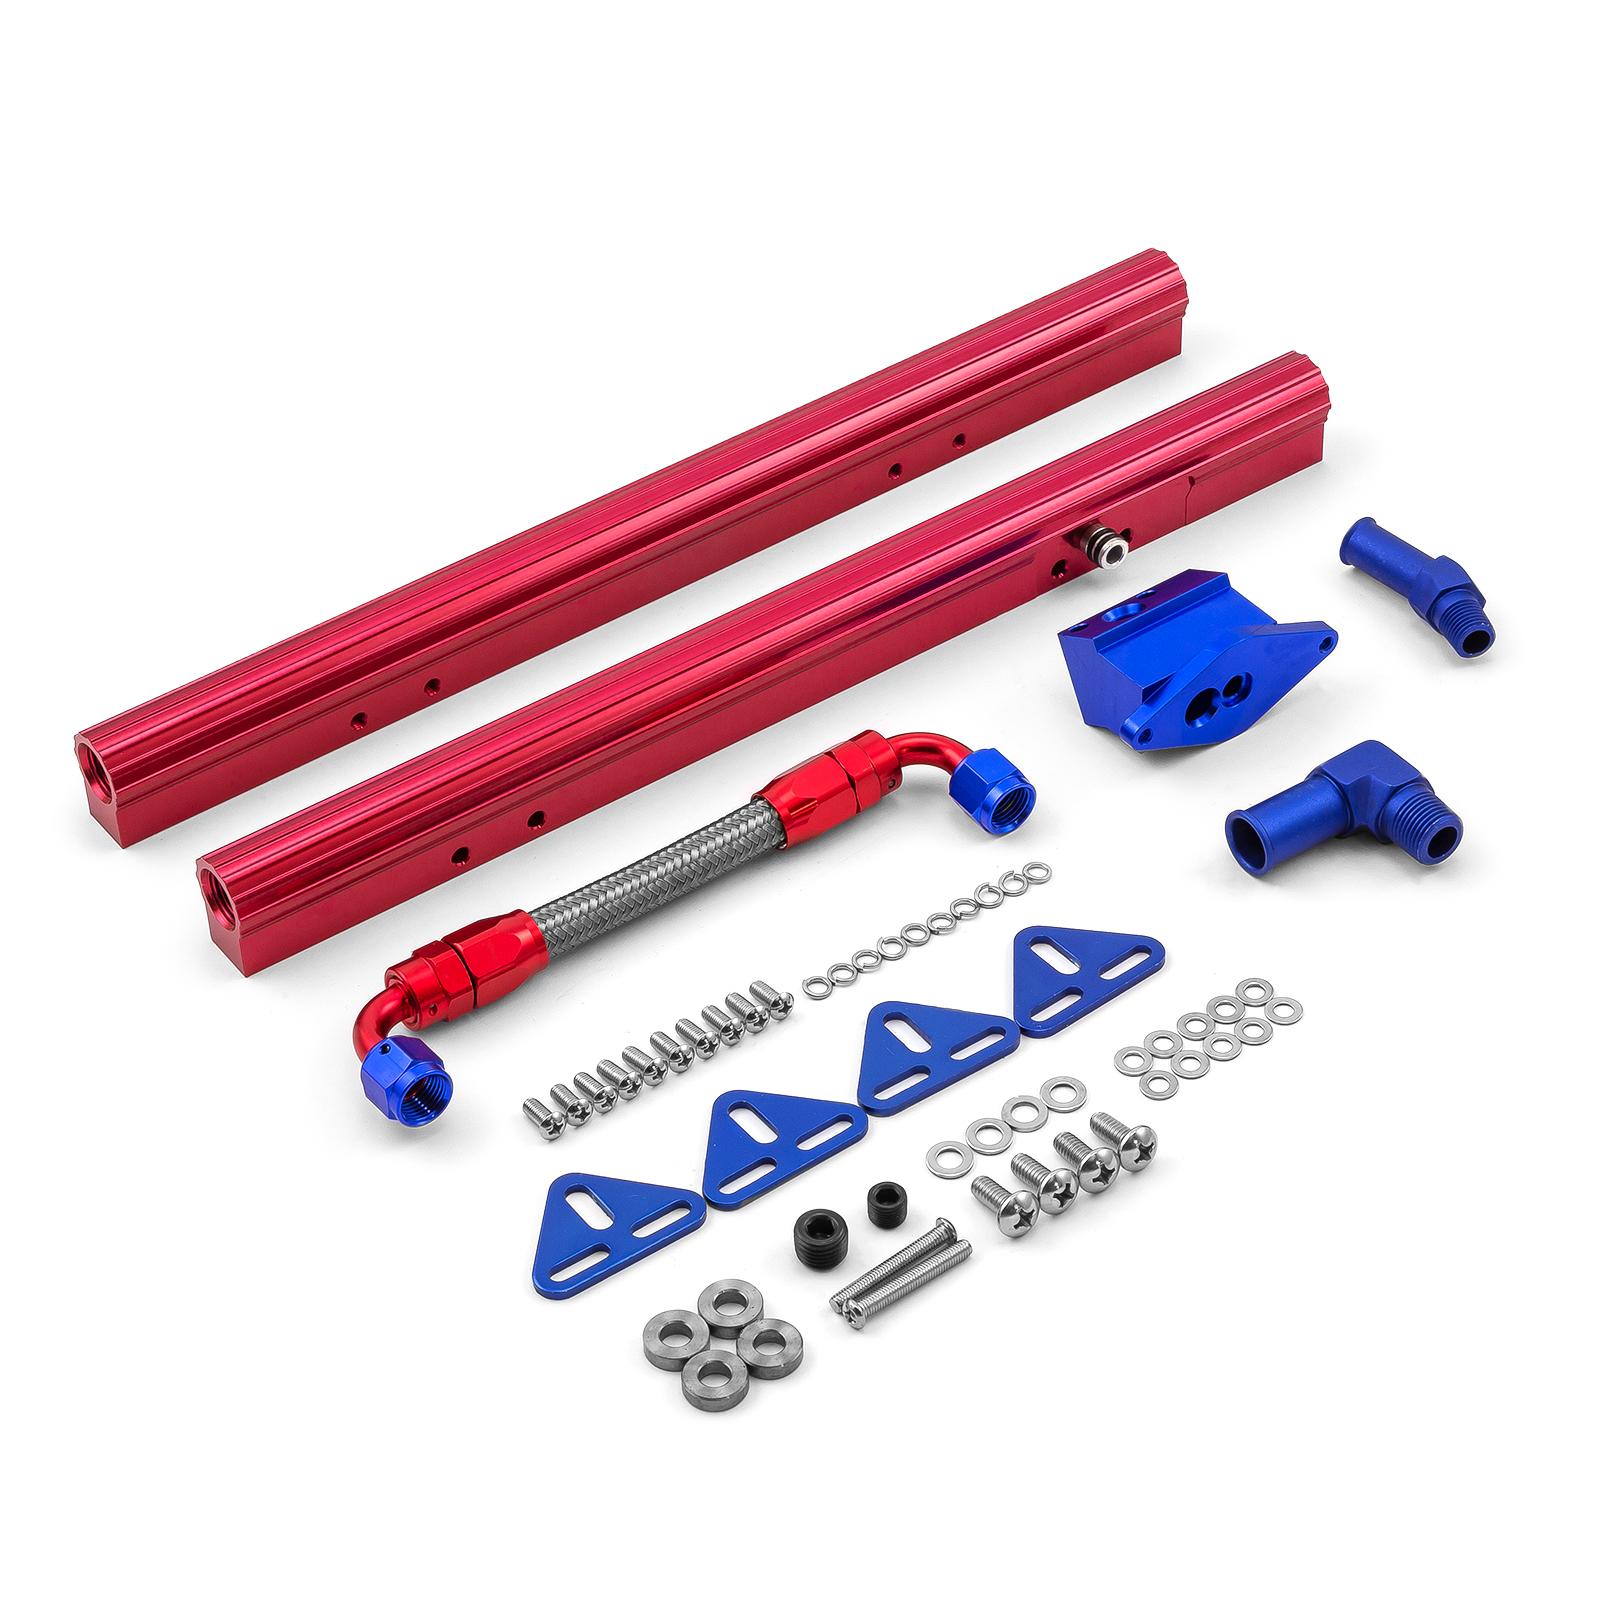 Details about fits Ford SB 289 302 351 Billet Aluminum Fuel Injector Rail  Kit (OEM Angled EFI)